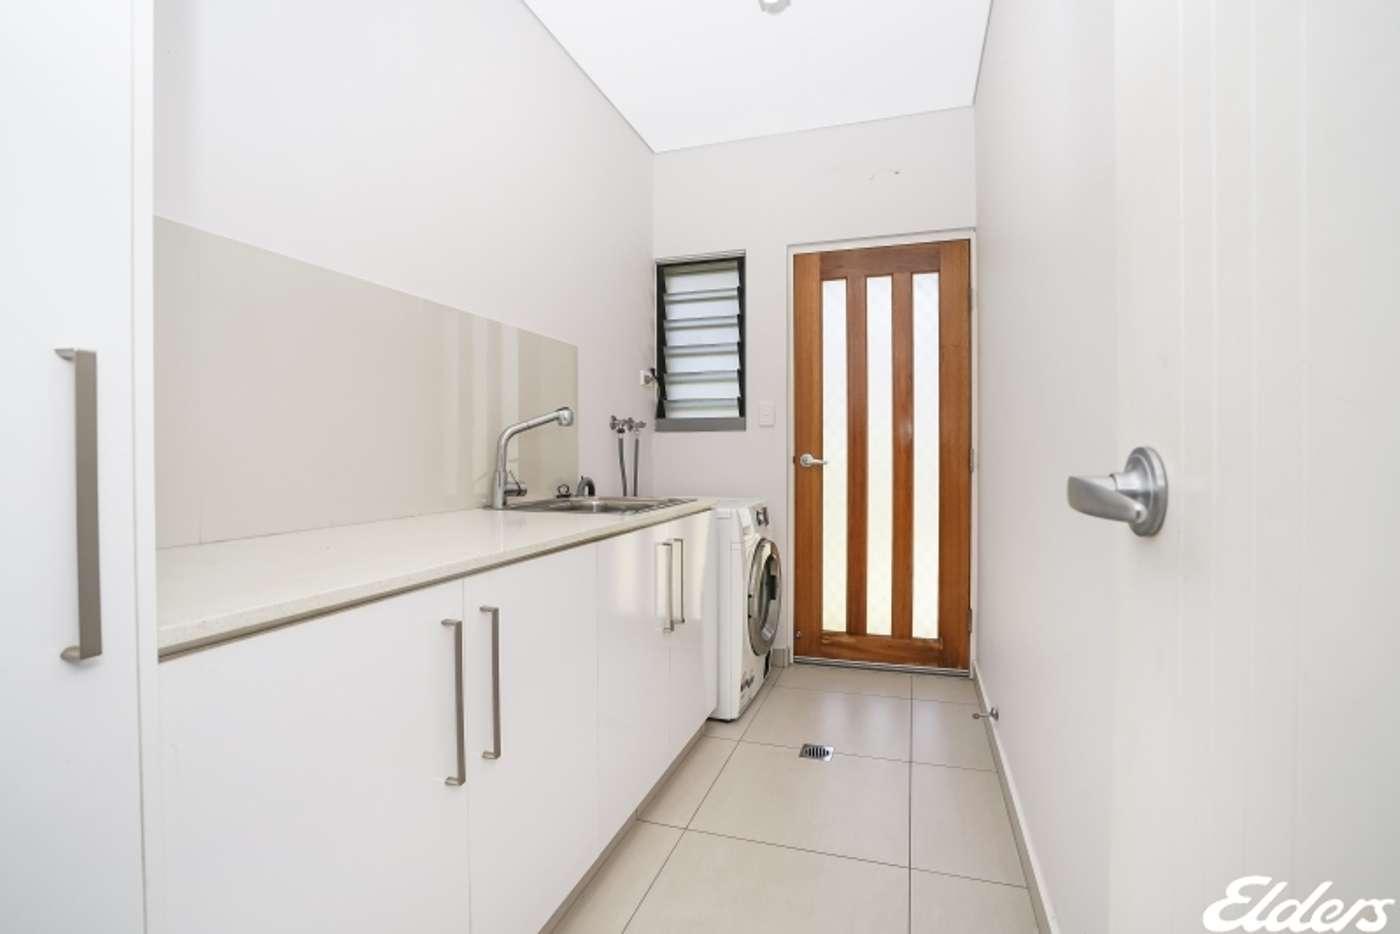 Sixth view of Homely house listing, 16 Barratt Street, Muirhead NT 810